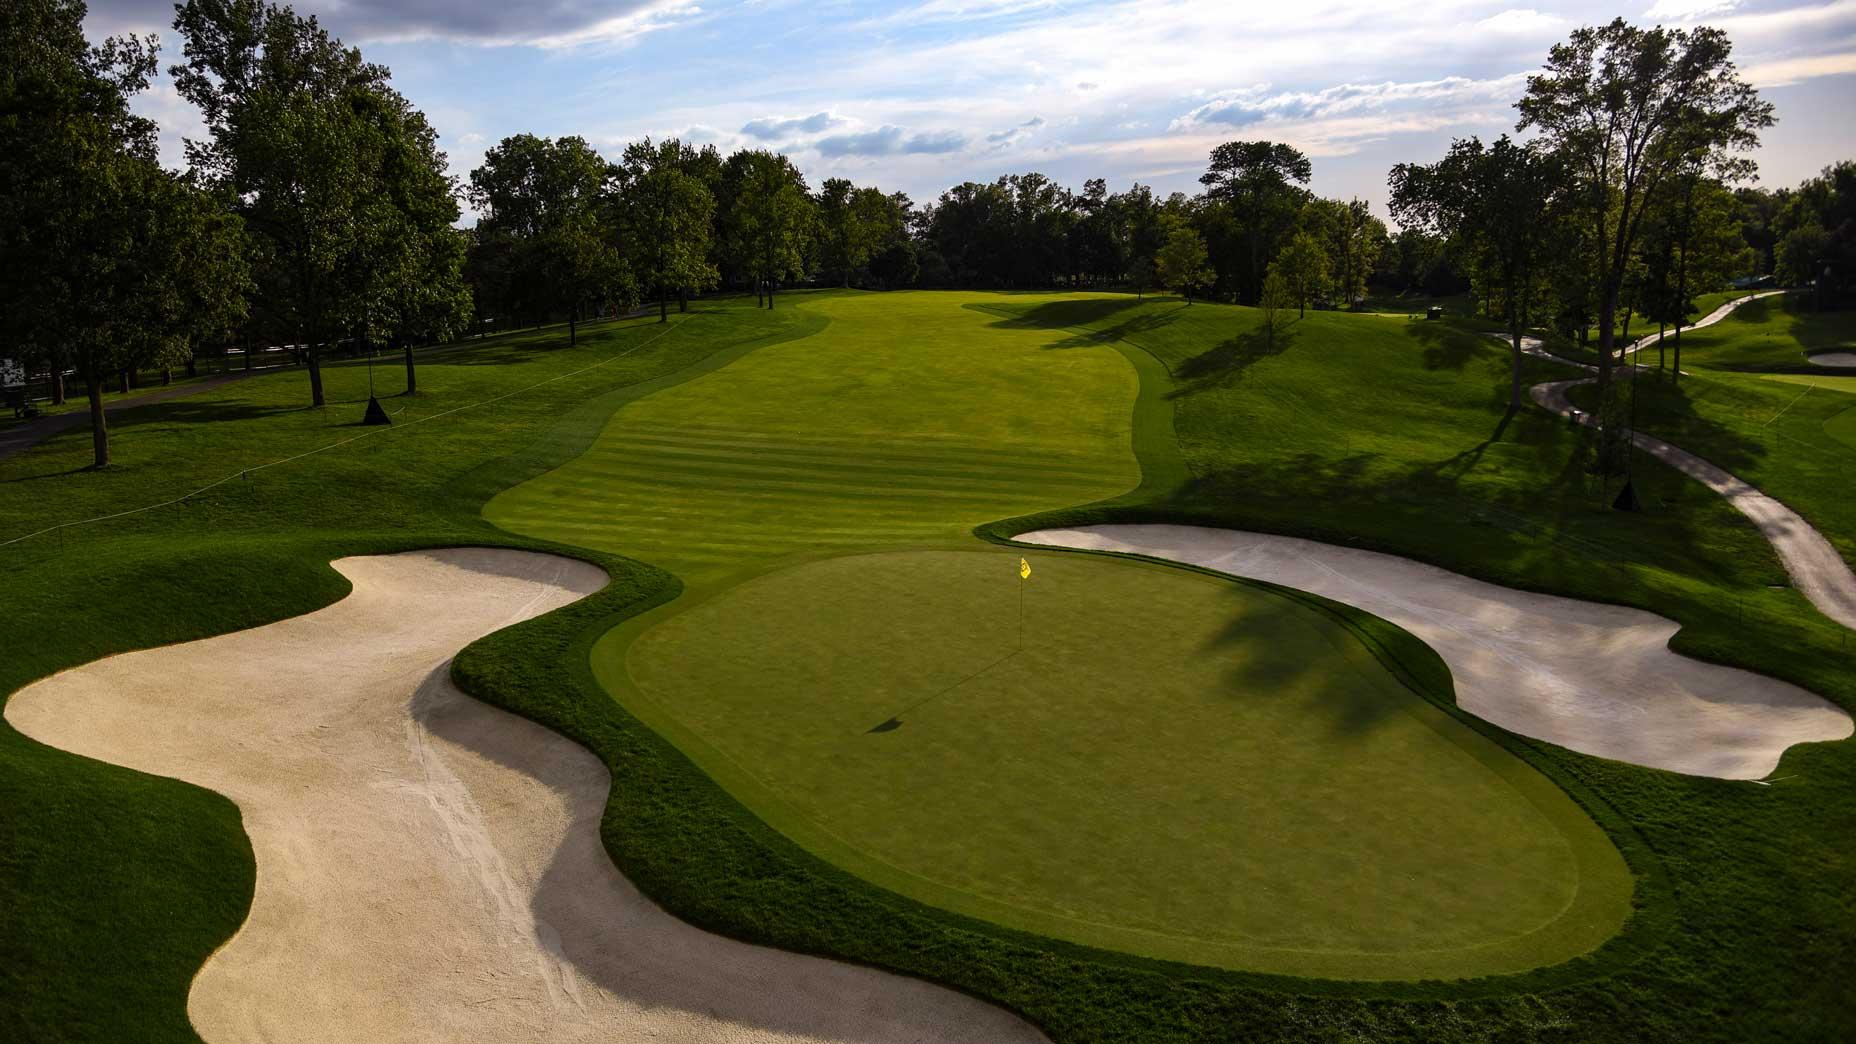 The par-4 13th hole at Muirfield Village Golf Club in 2017.